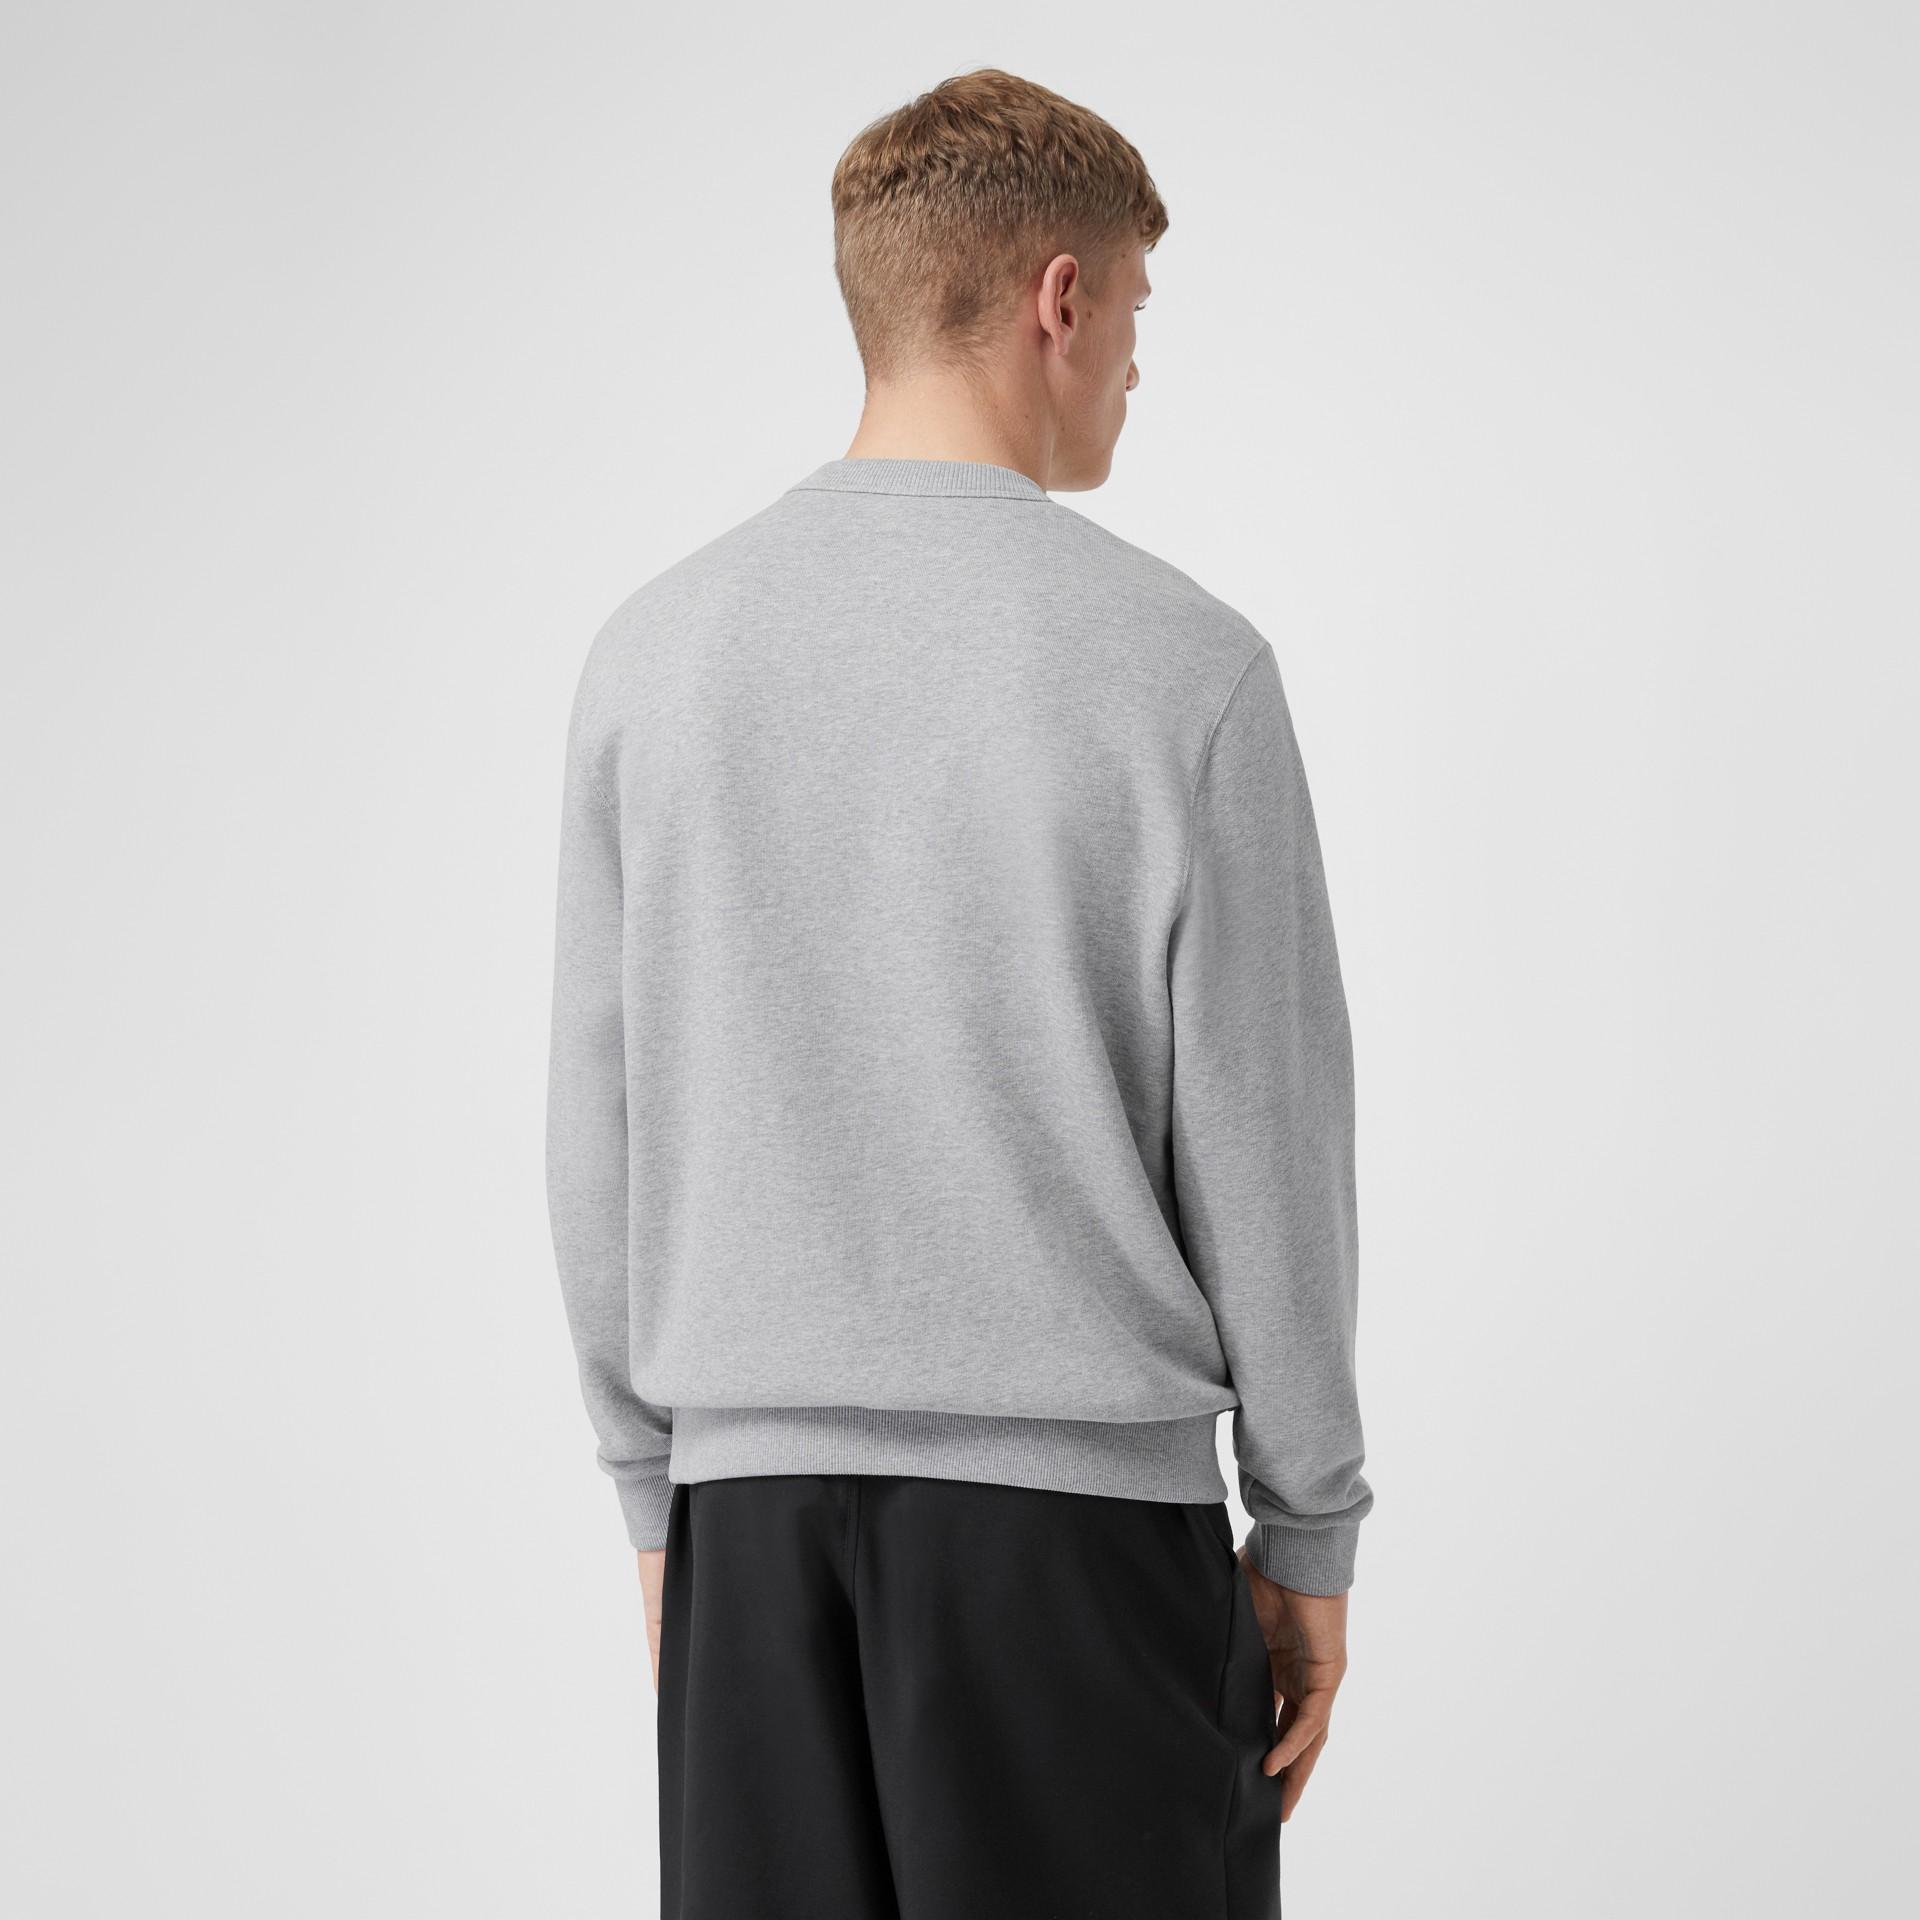 Logo Appliqué Cotton Sweatshirt in Pale Grey Melange - Men | Burberry United Kingdom - gallery image 2